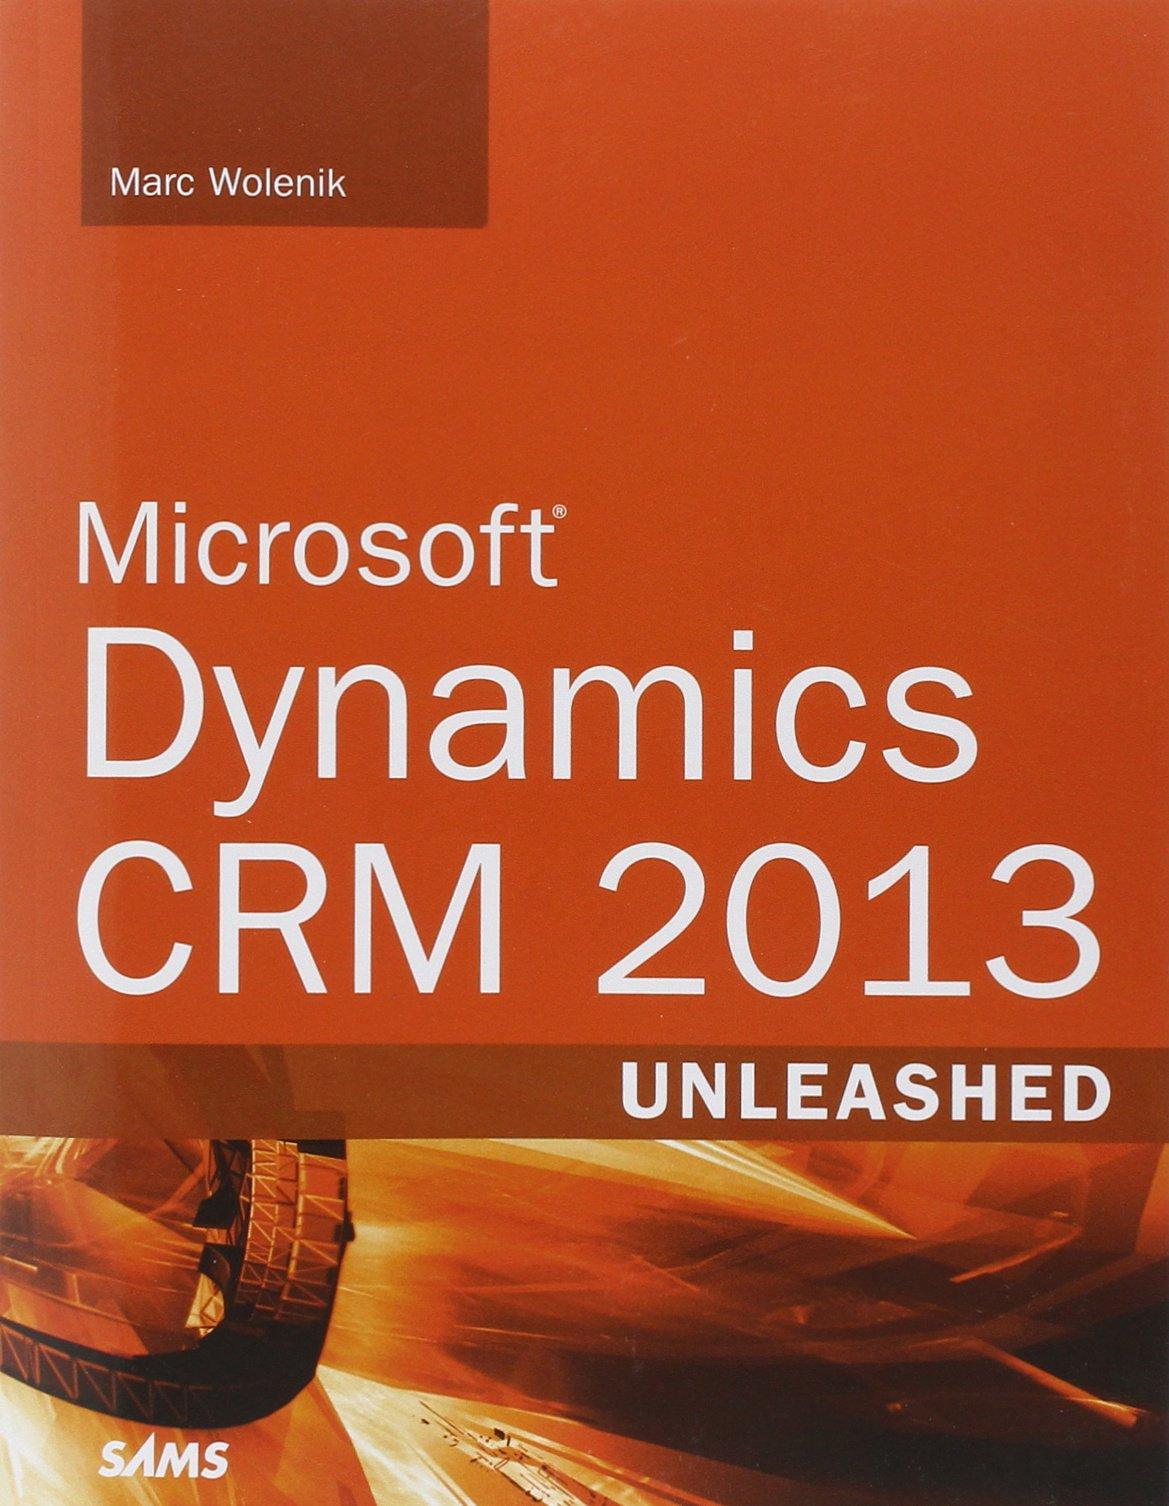 Microsoft Dynamics Crm 2013 Unleashed Amazon Marc Wolenik